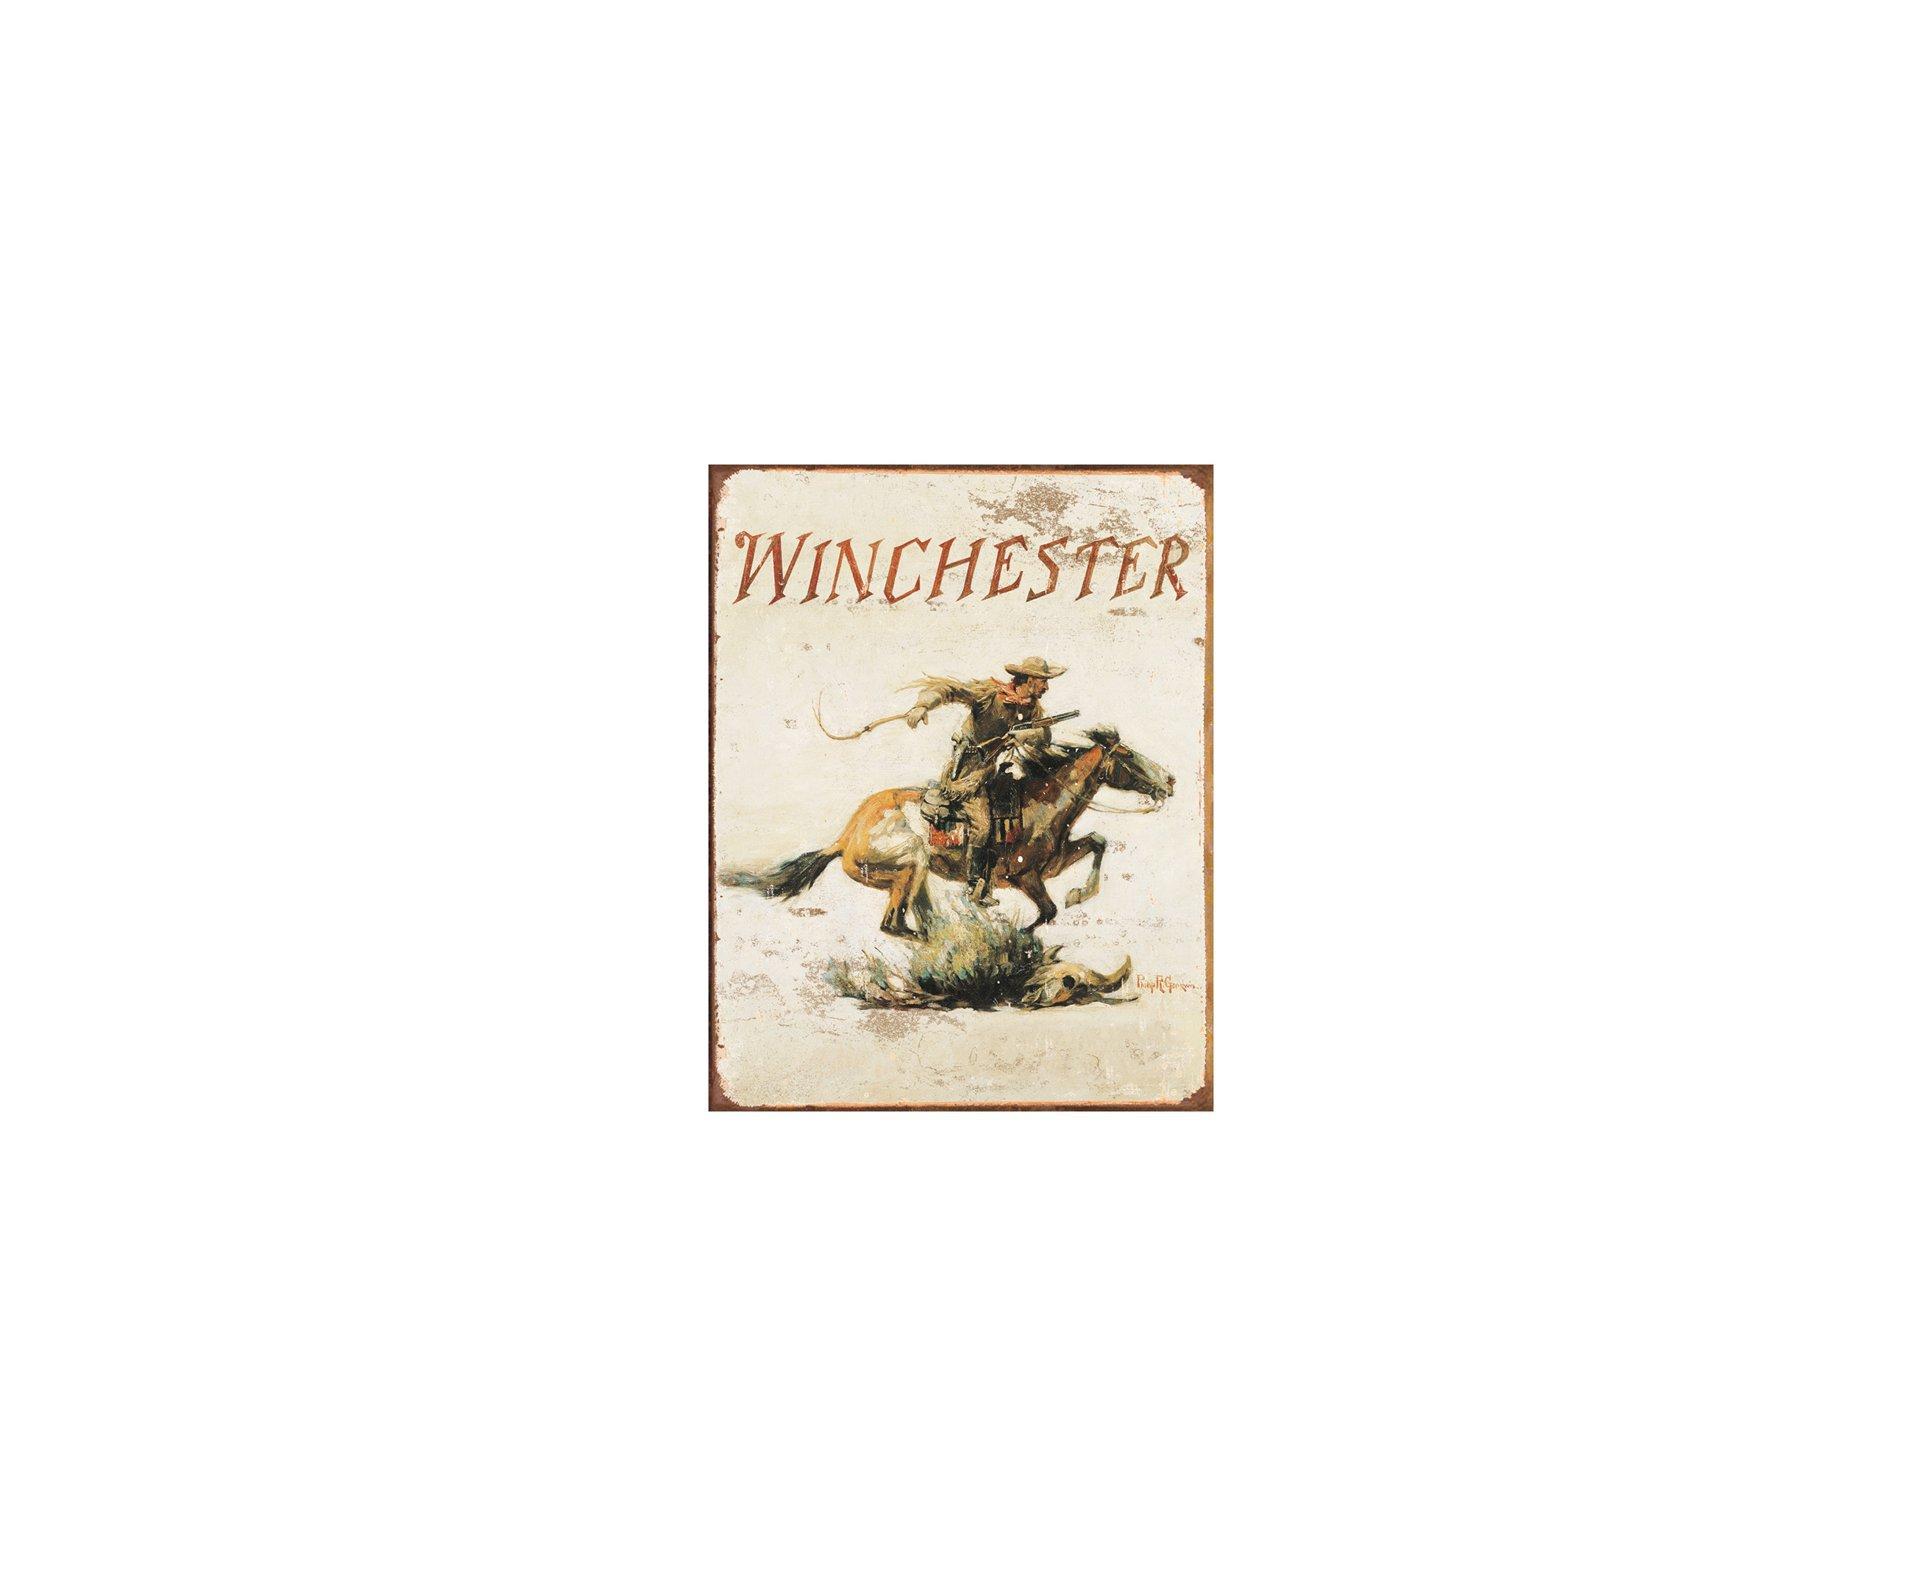 Placa Metálica Decorativa Winchester - Rossi